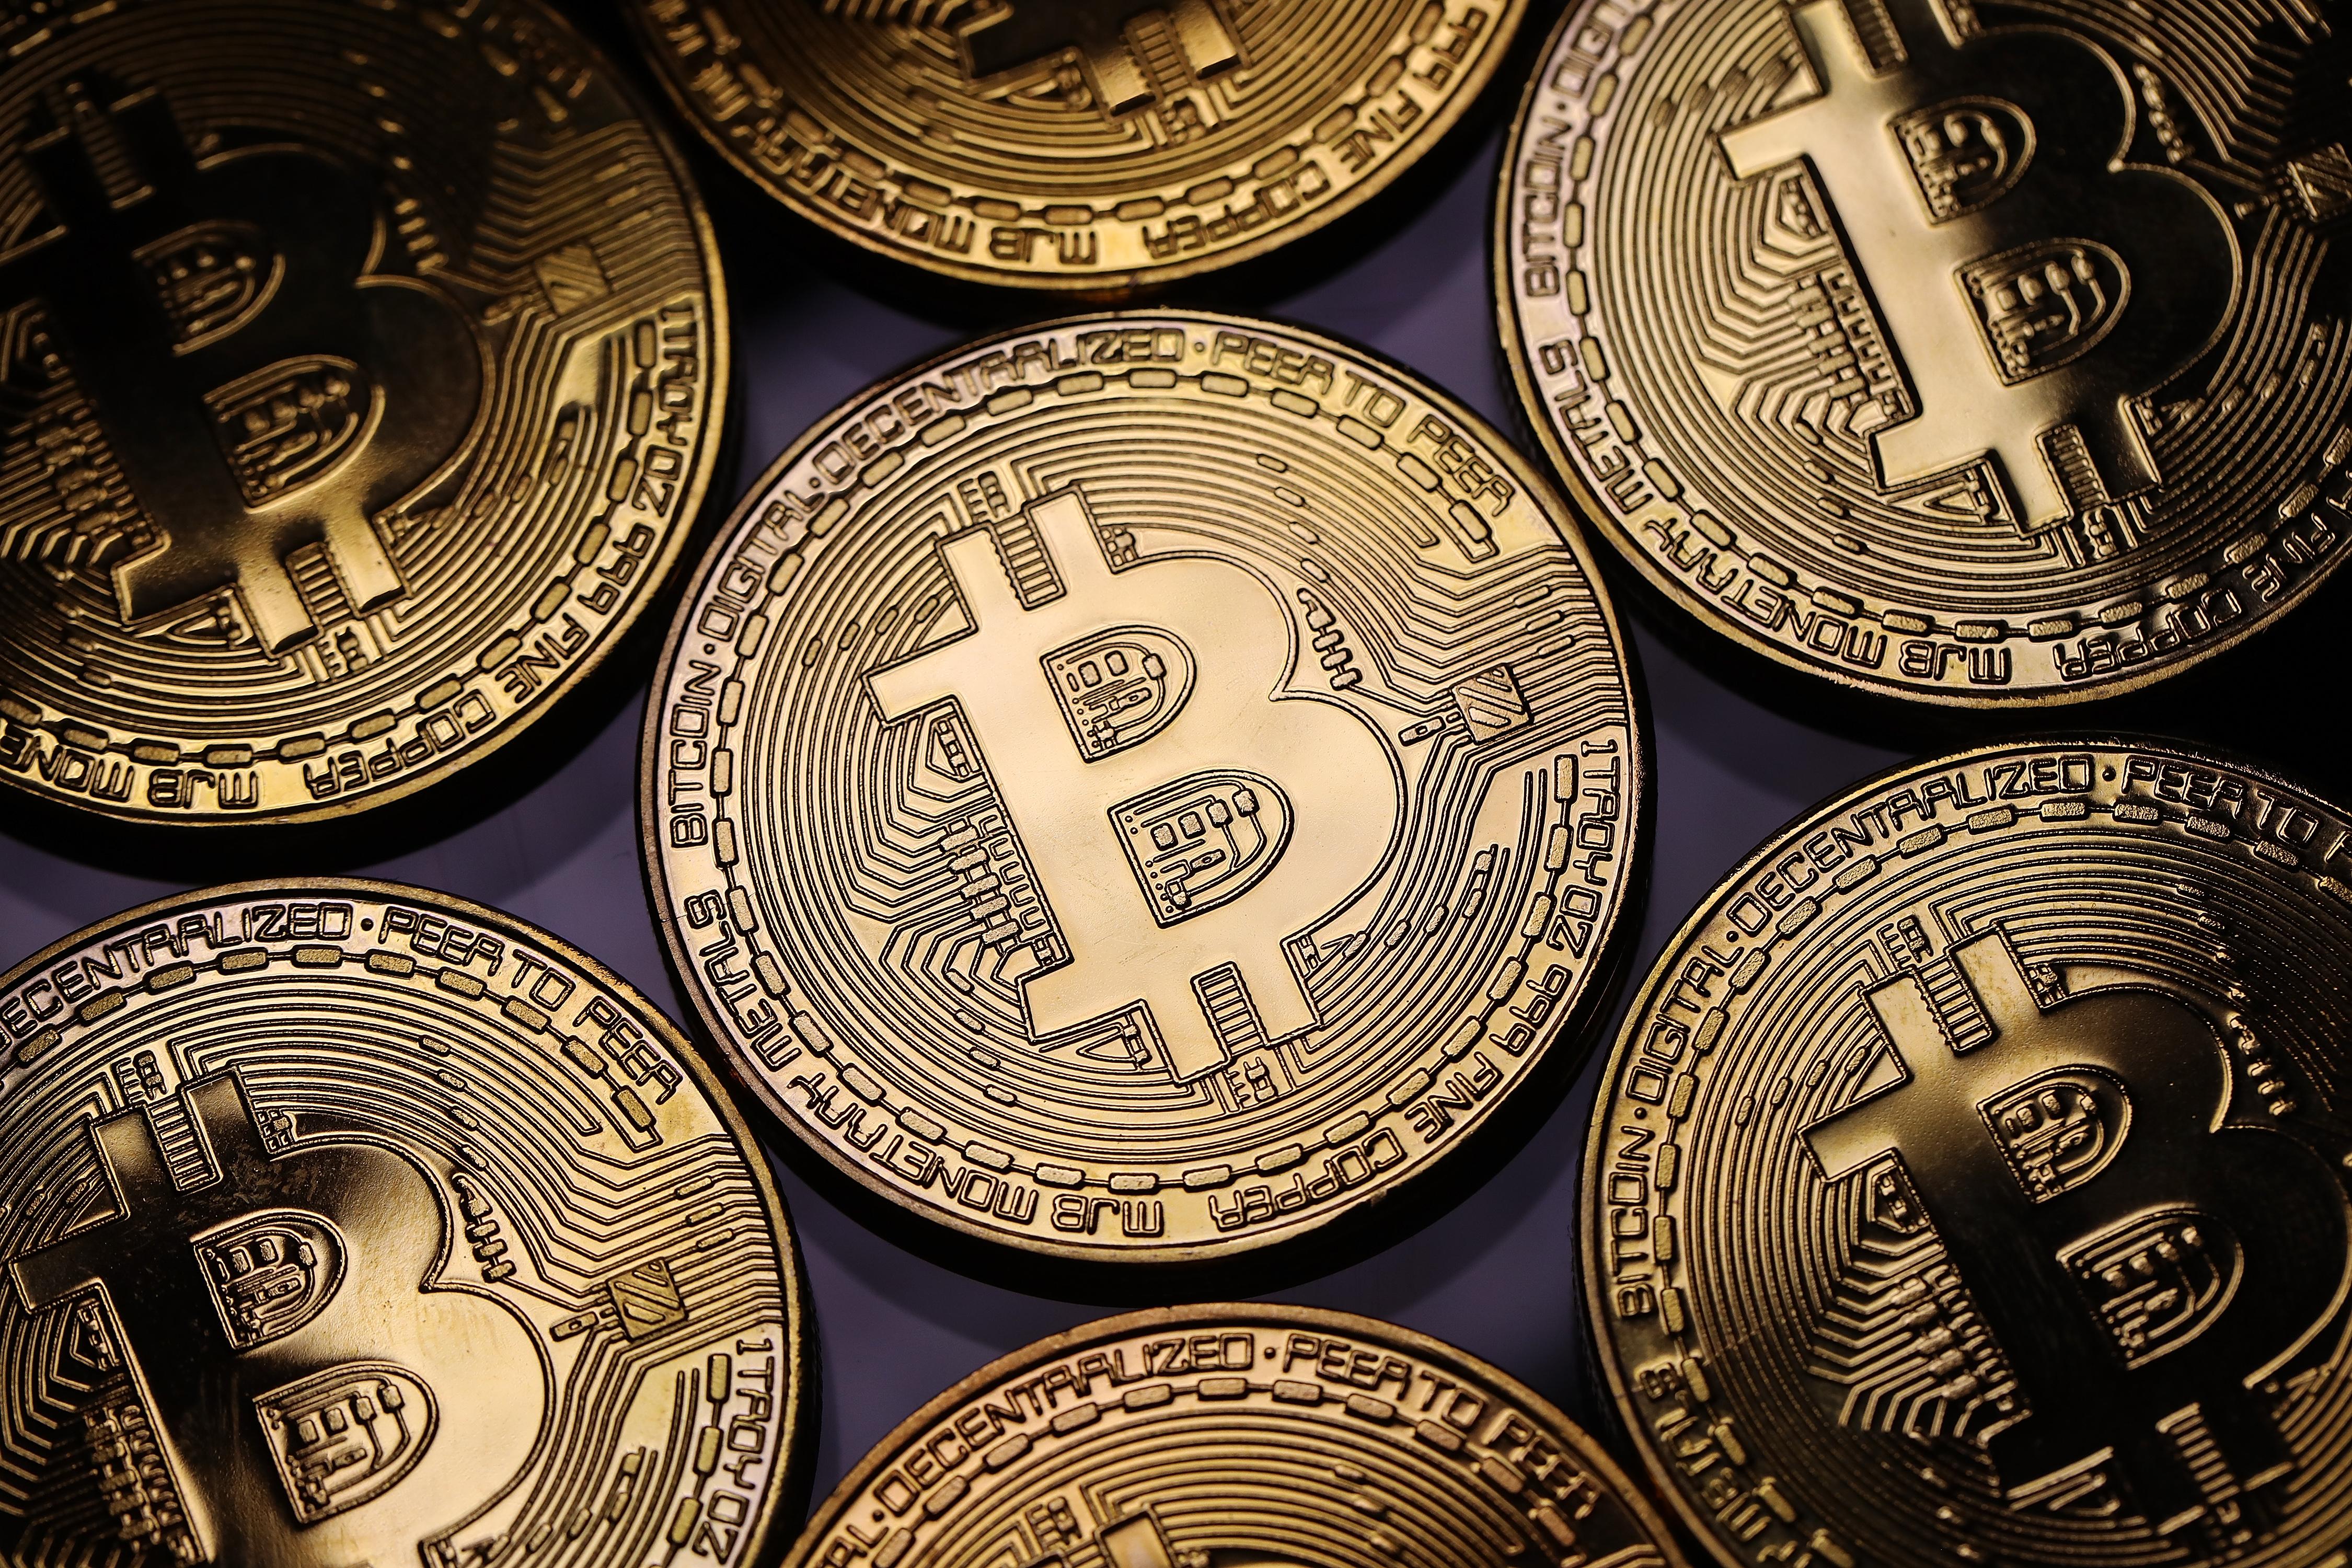 Stocker bitcoins news hollywood betting durban